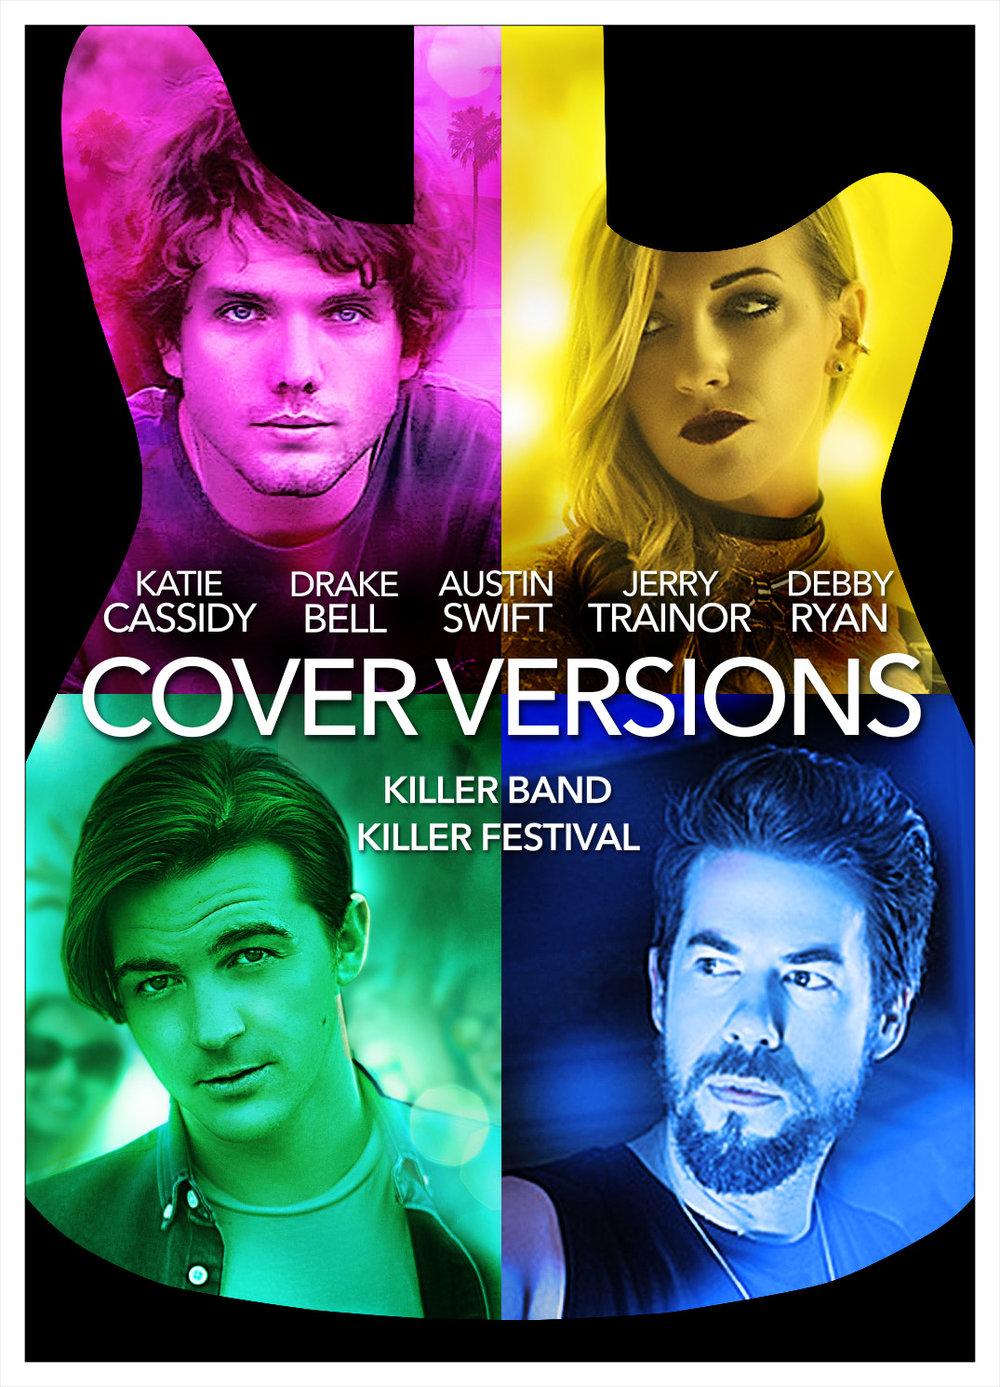 CoverVersions_KA.jpg